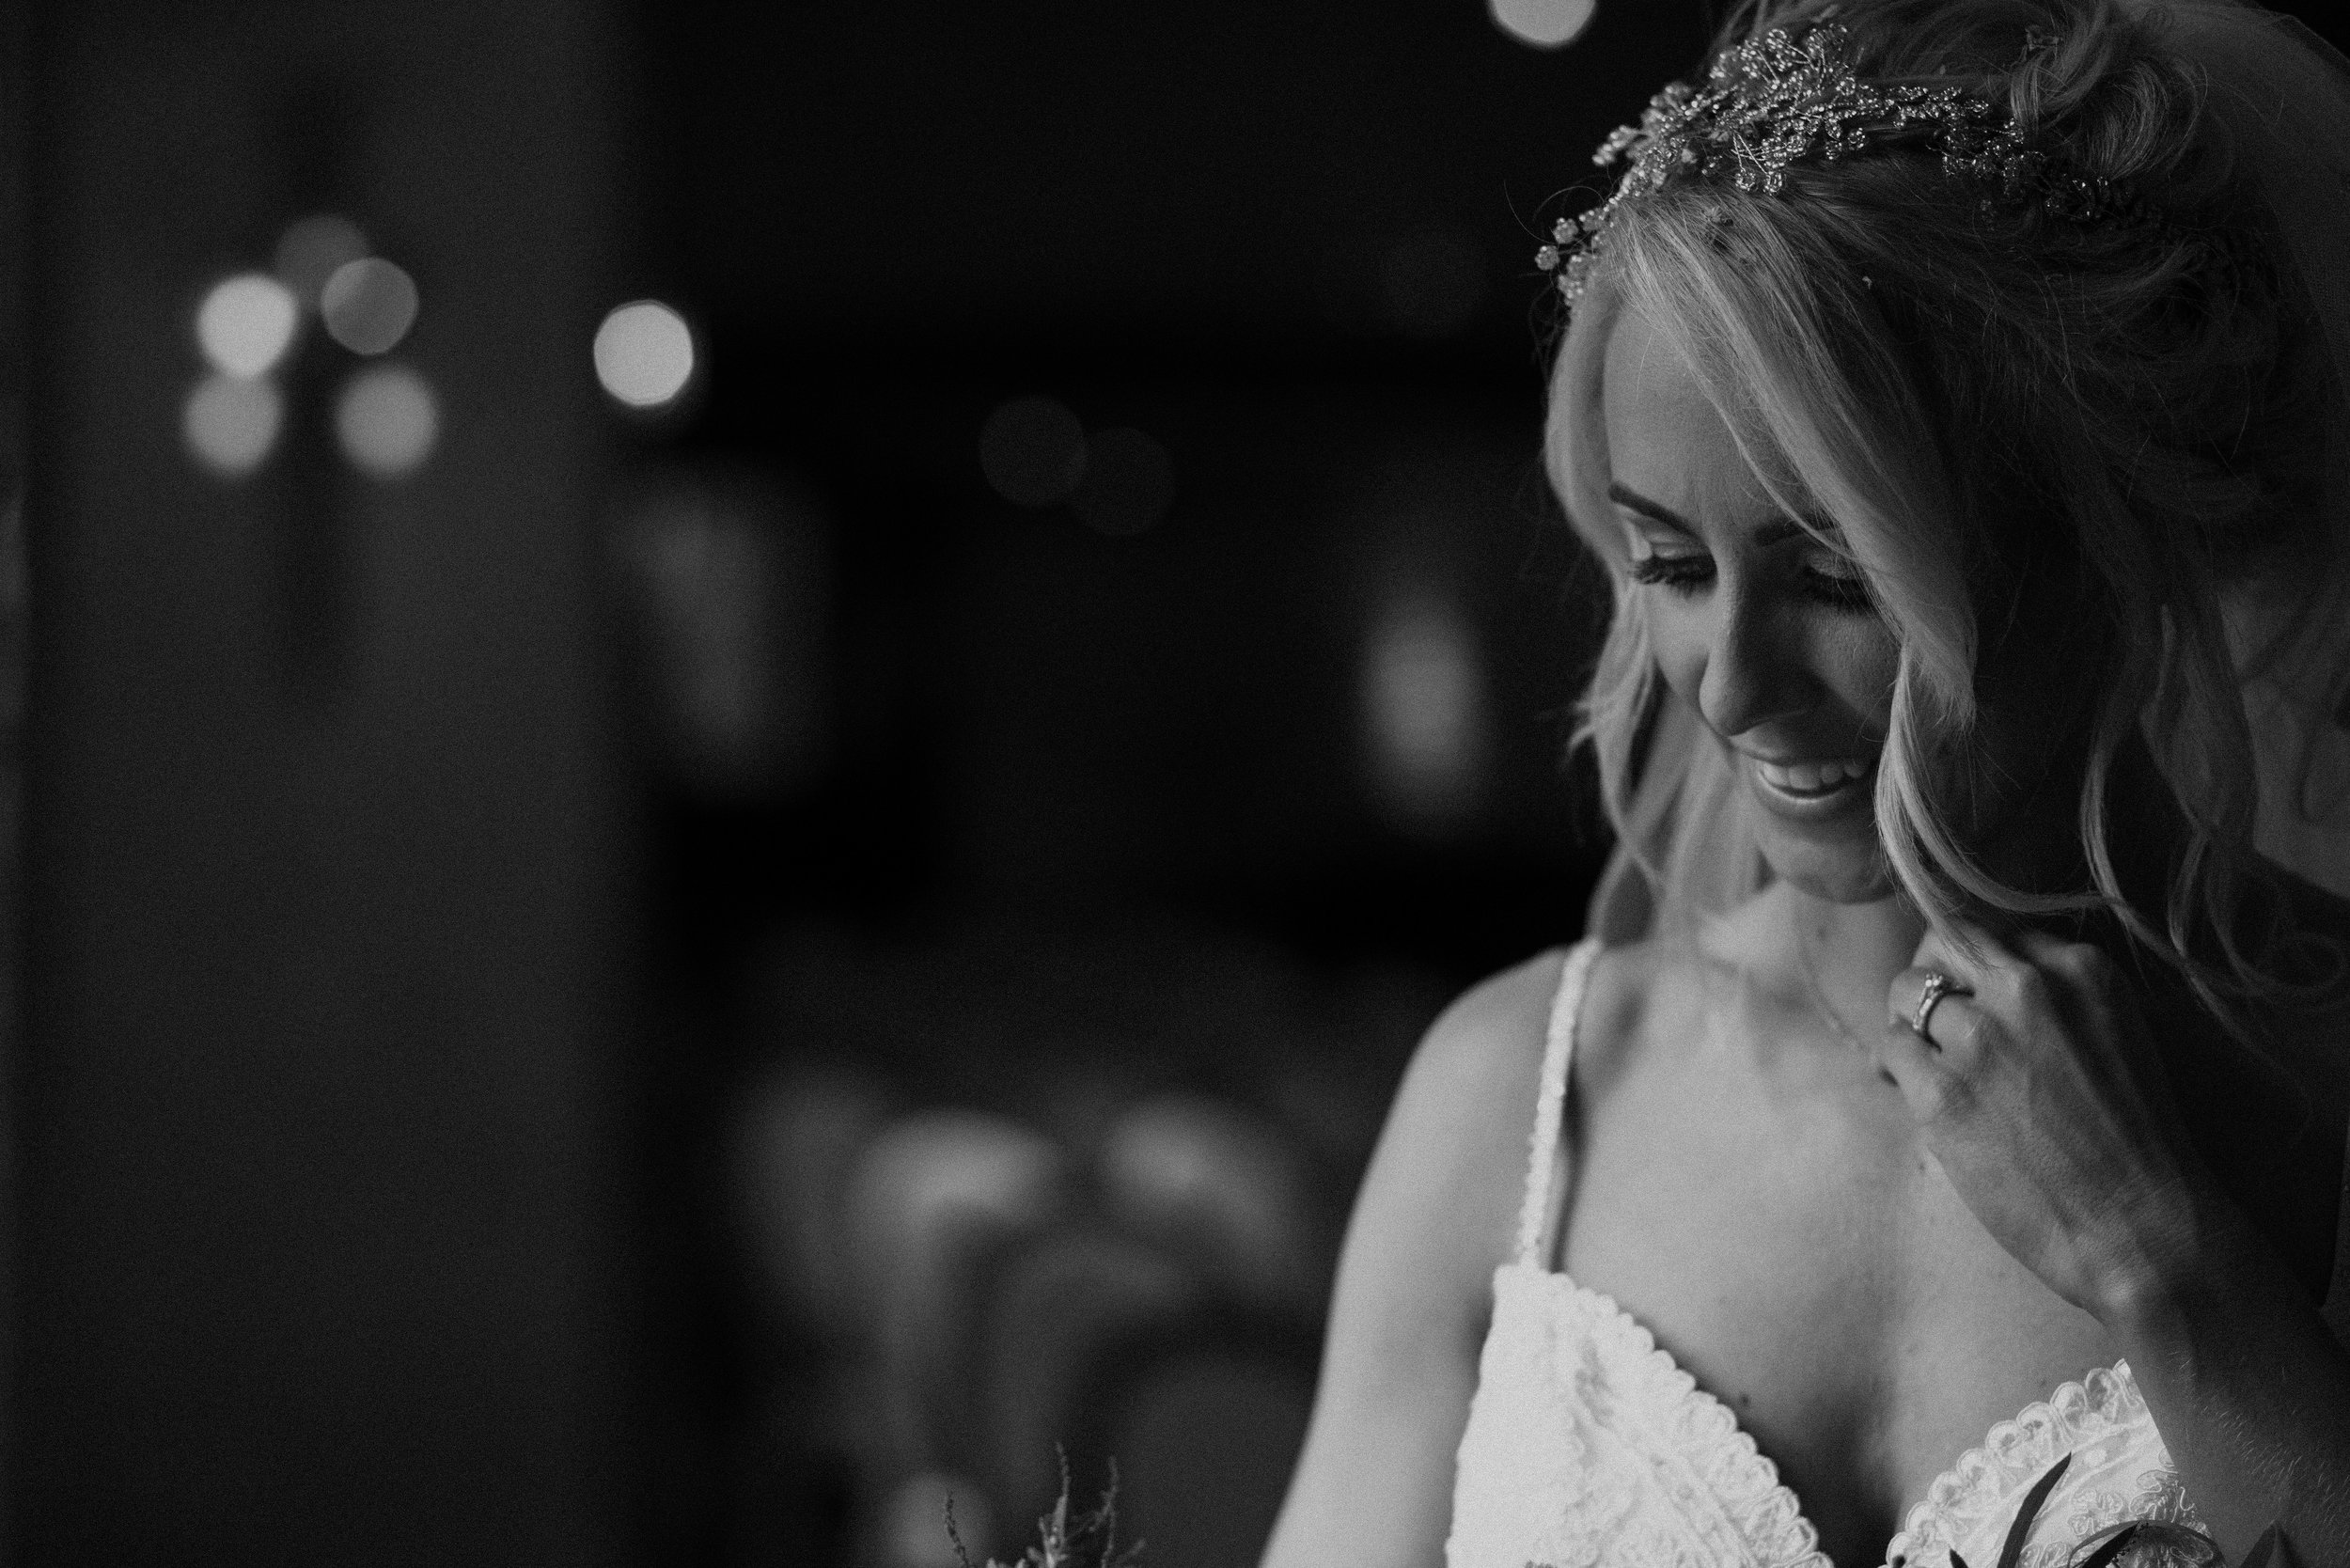 Moon-river-weddingvideography-uk.jpg